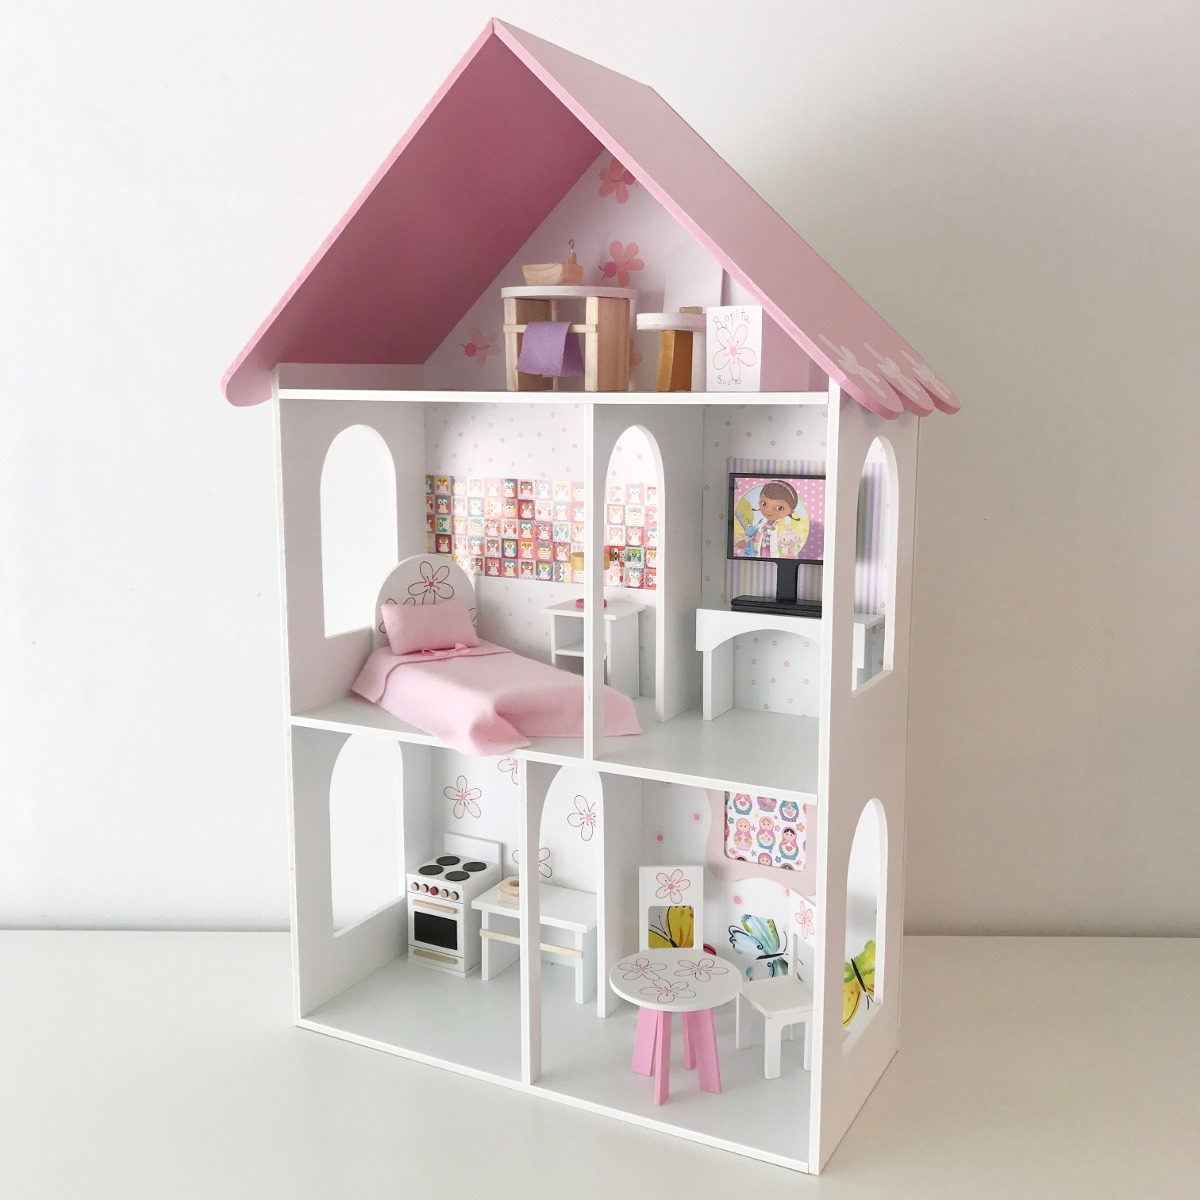 Casa Mu Ecas Barbie Completa Casita Madera Pintada Muebles  # Muebles Waldorf